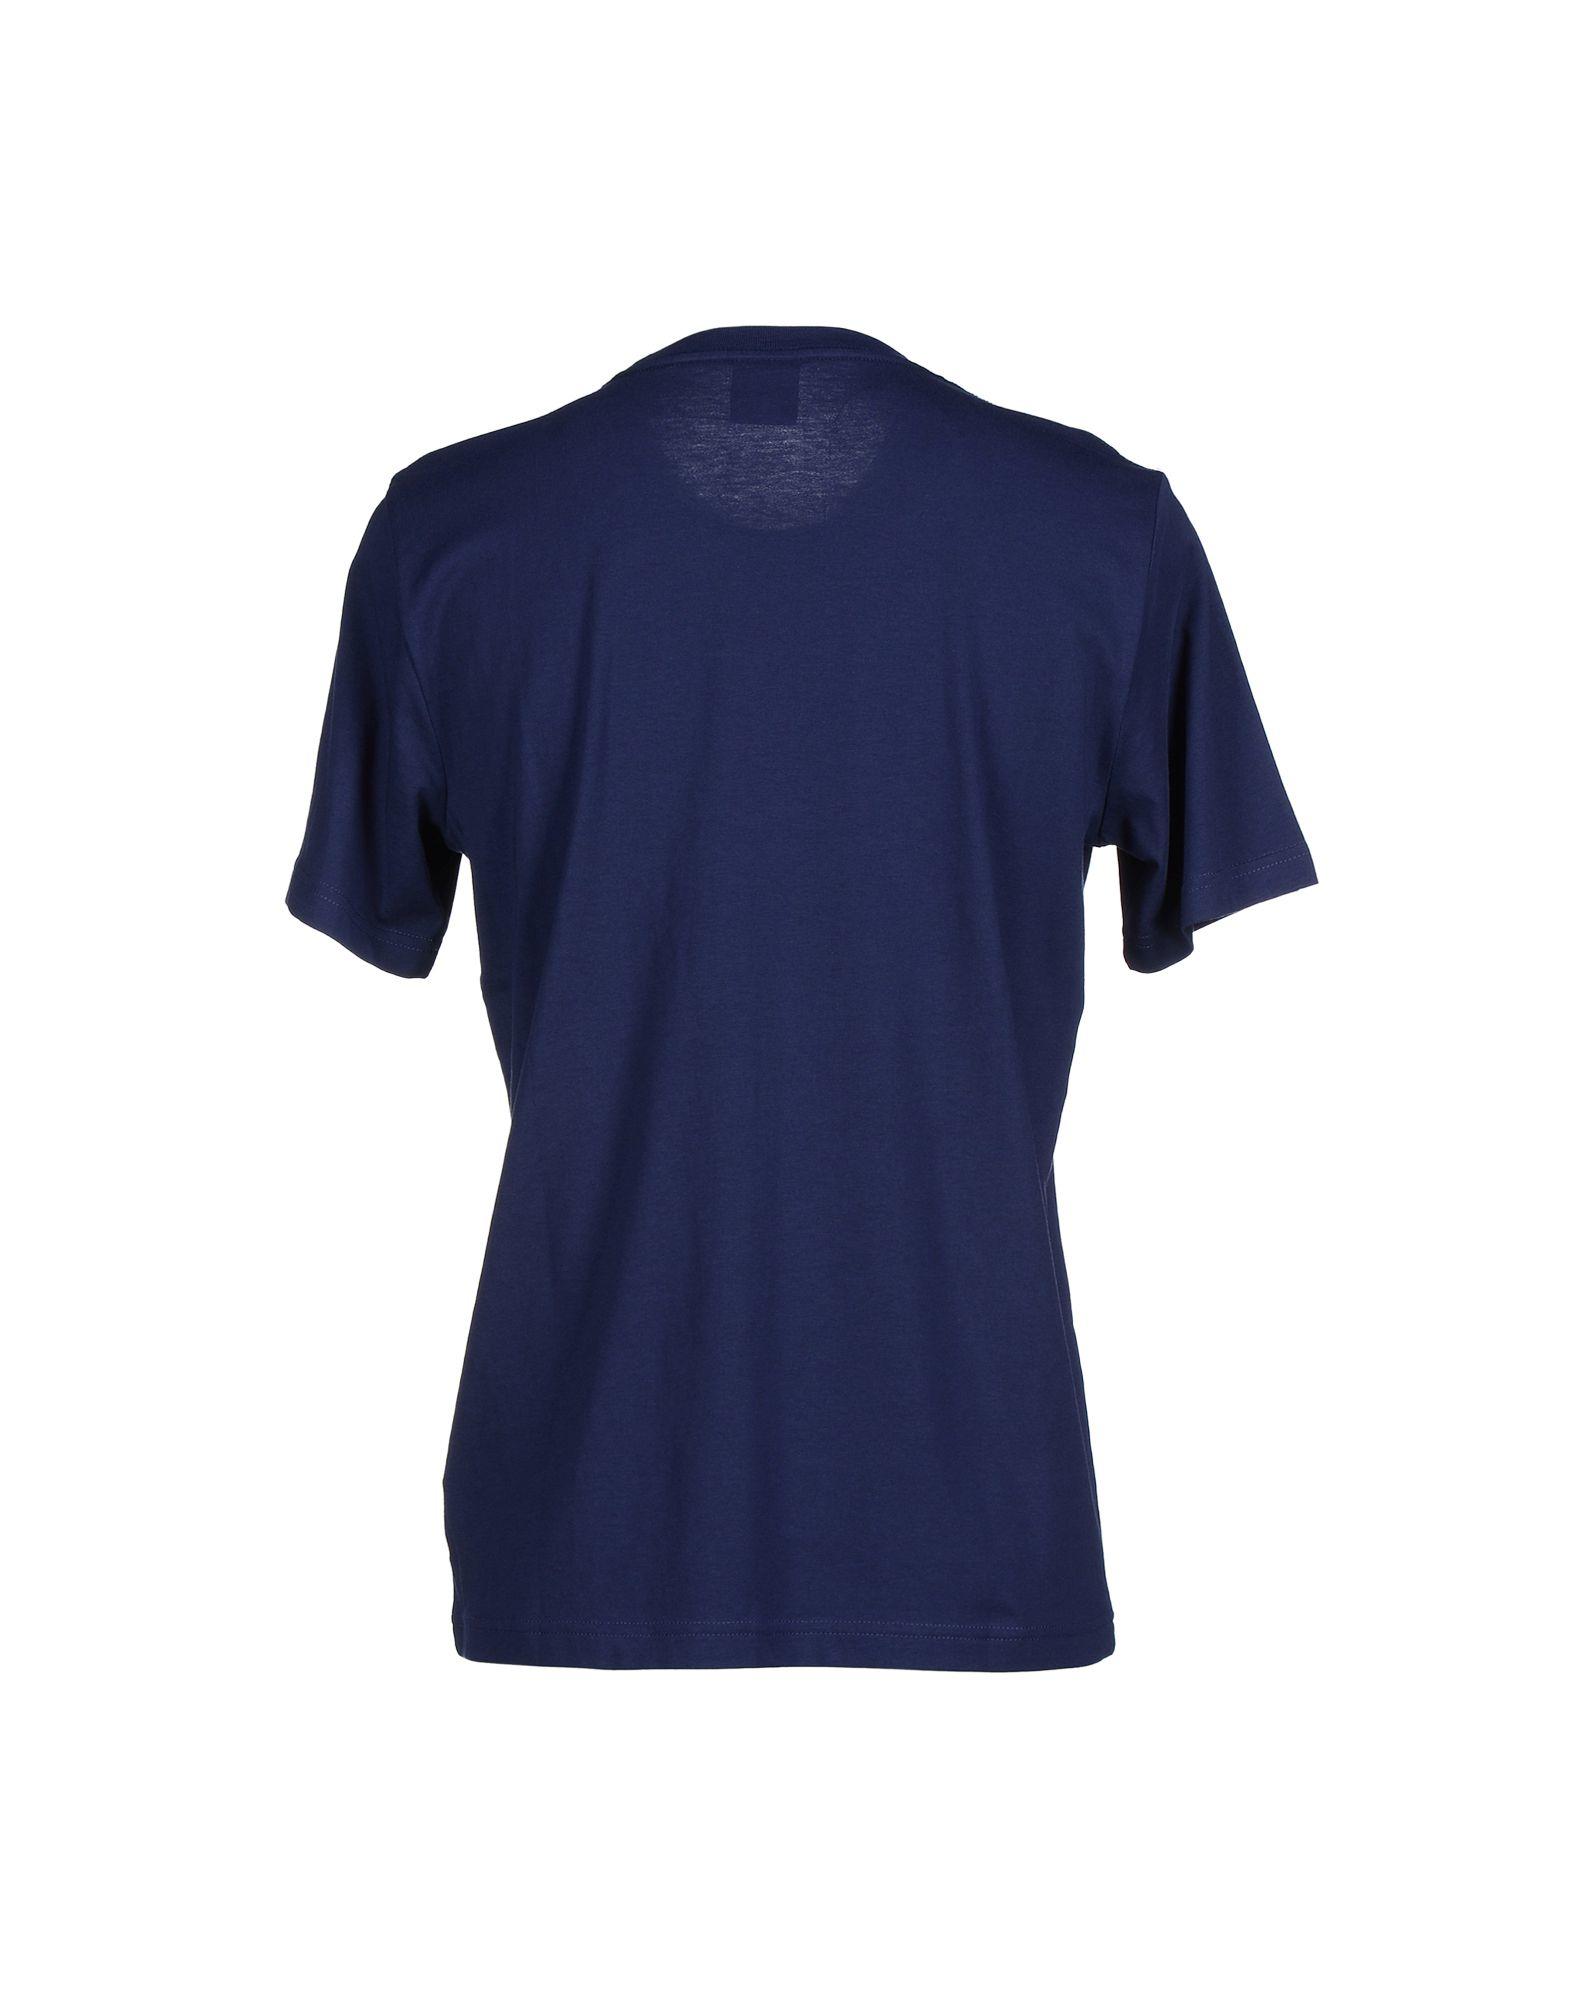 Puma t shirt in blue for men dark blue lyst for T shirt dark blue